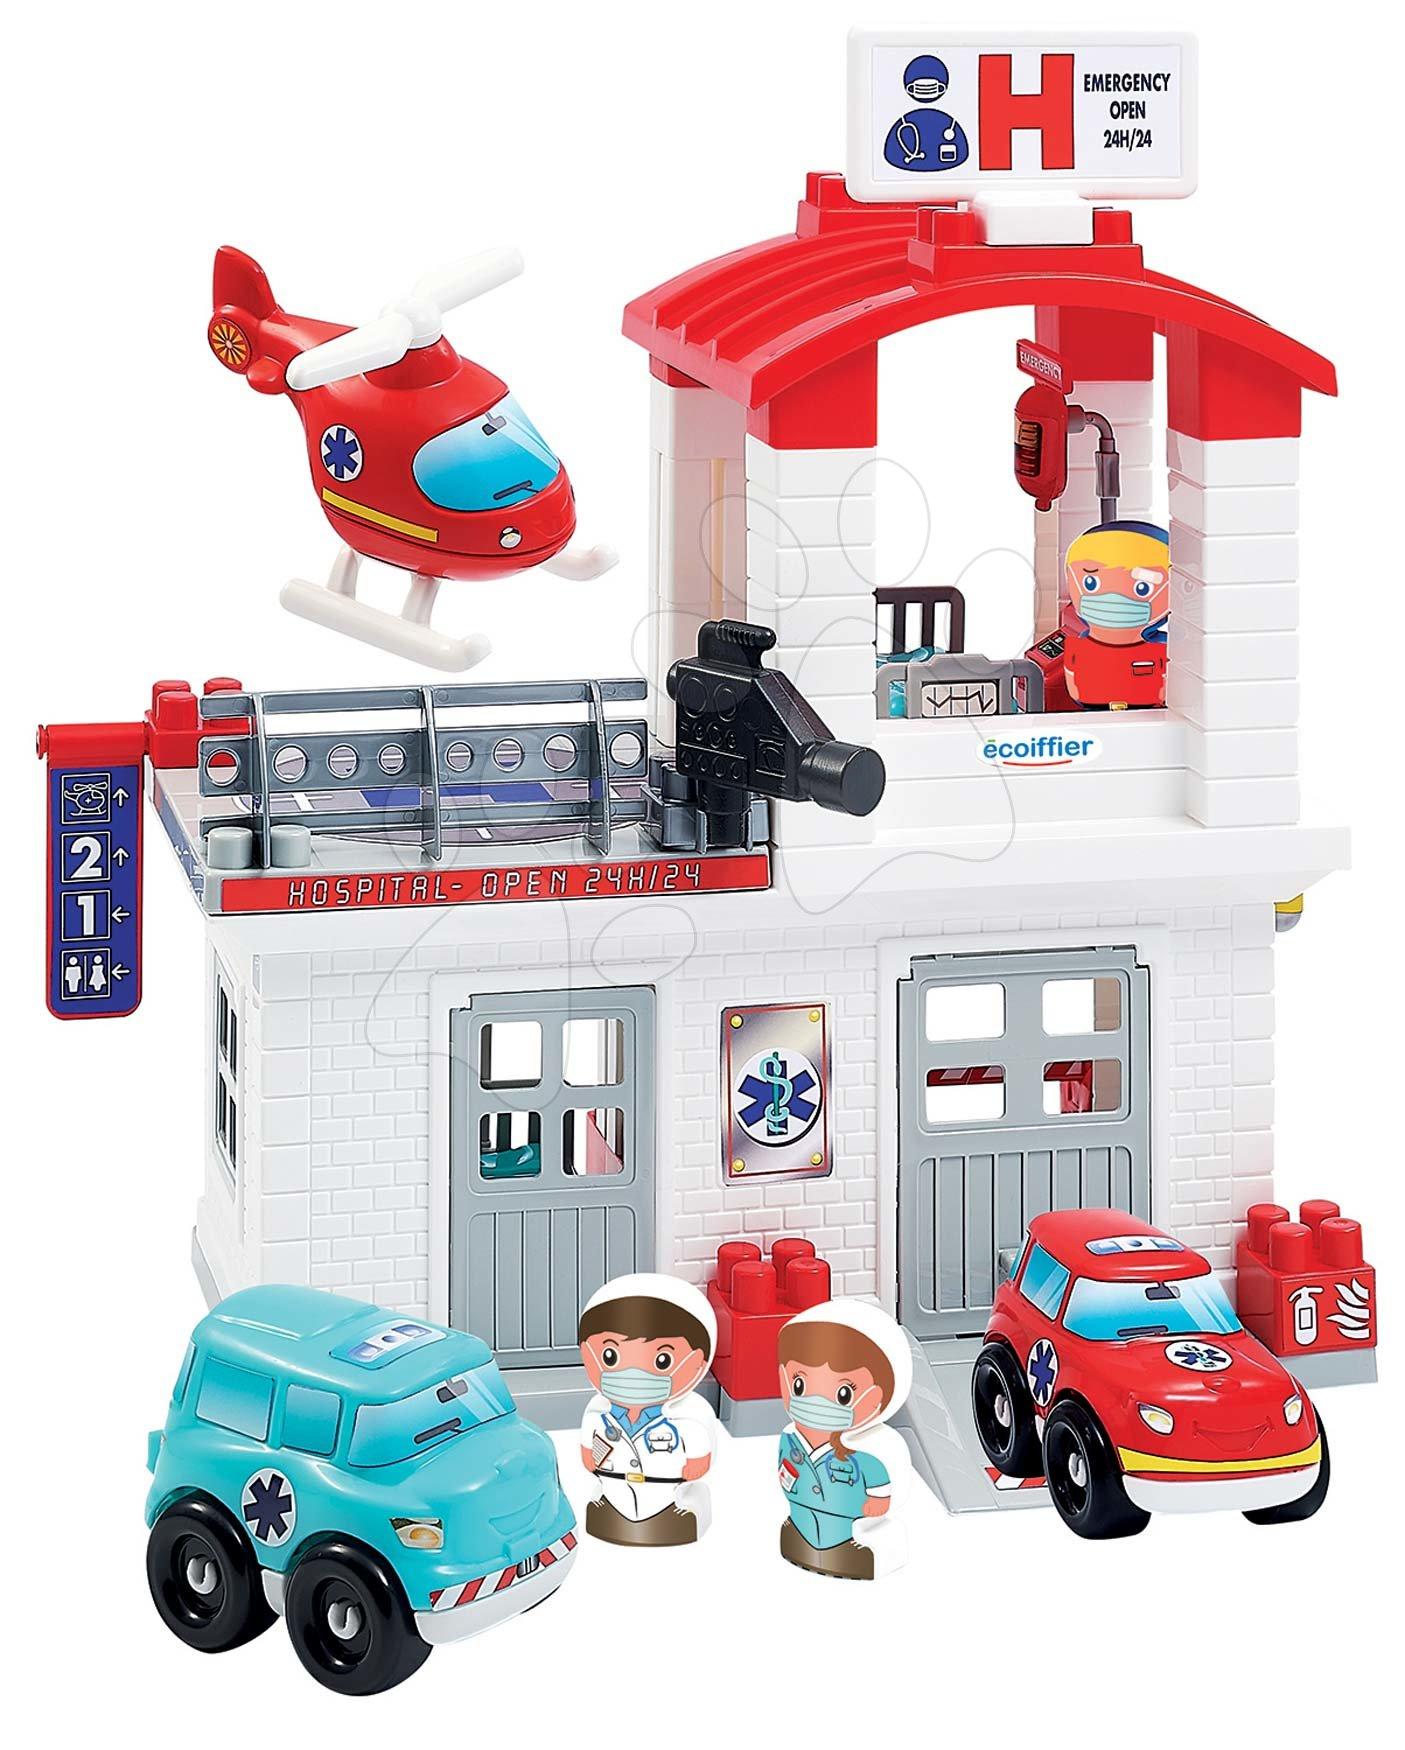 Slagalice Abrick - Slagalica Bolnica Hospital Abrick Ecoiffier s 3 vozila i 3 figurice od 18 mjes